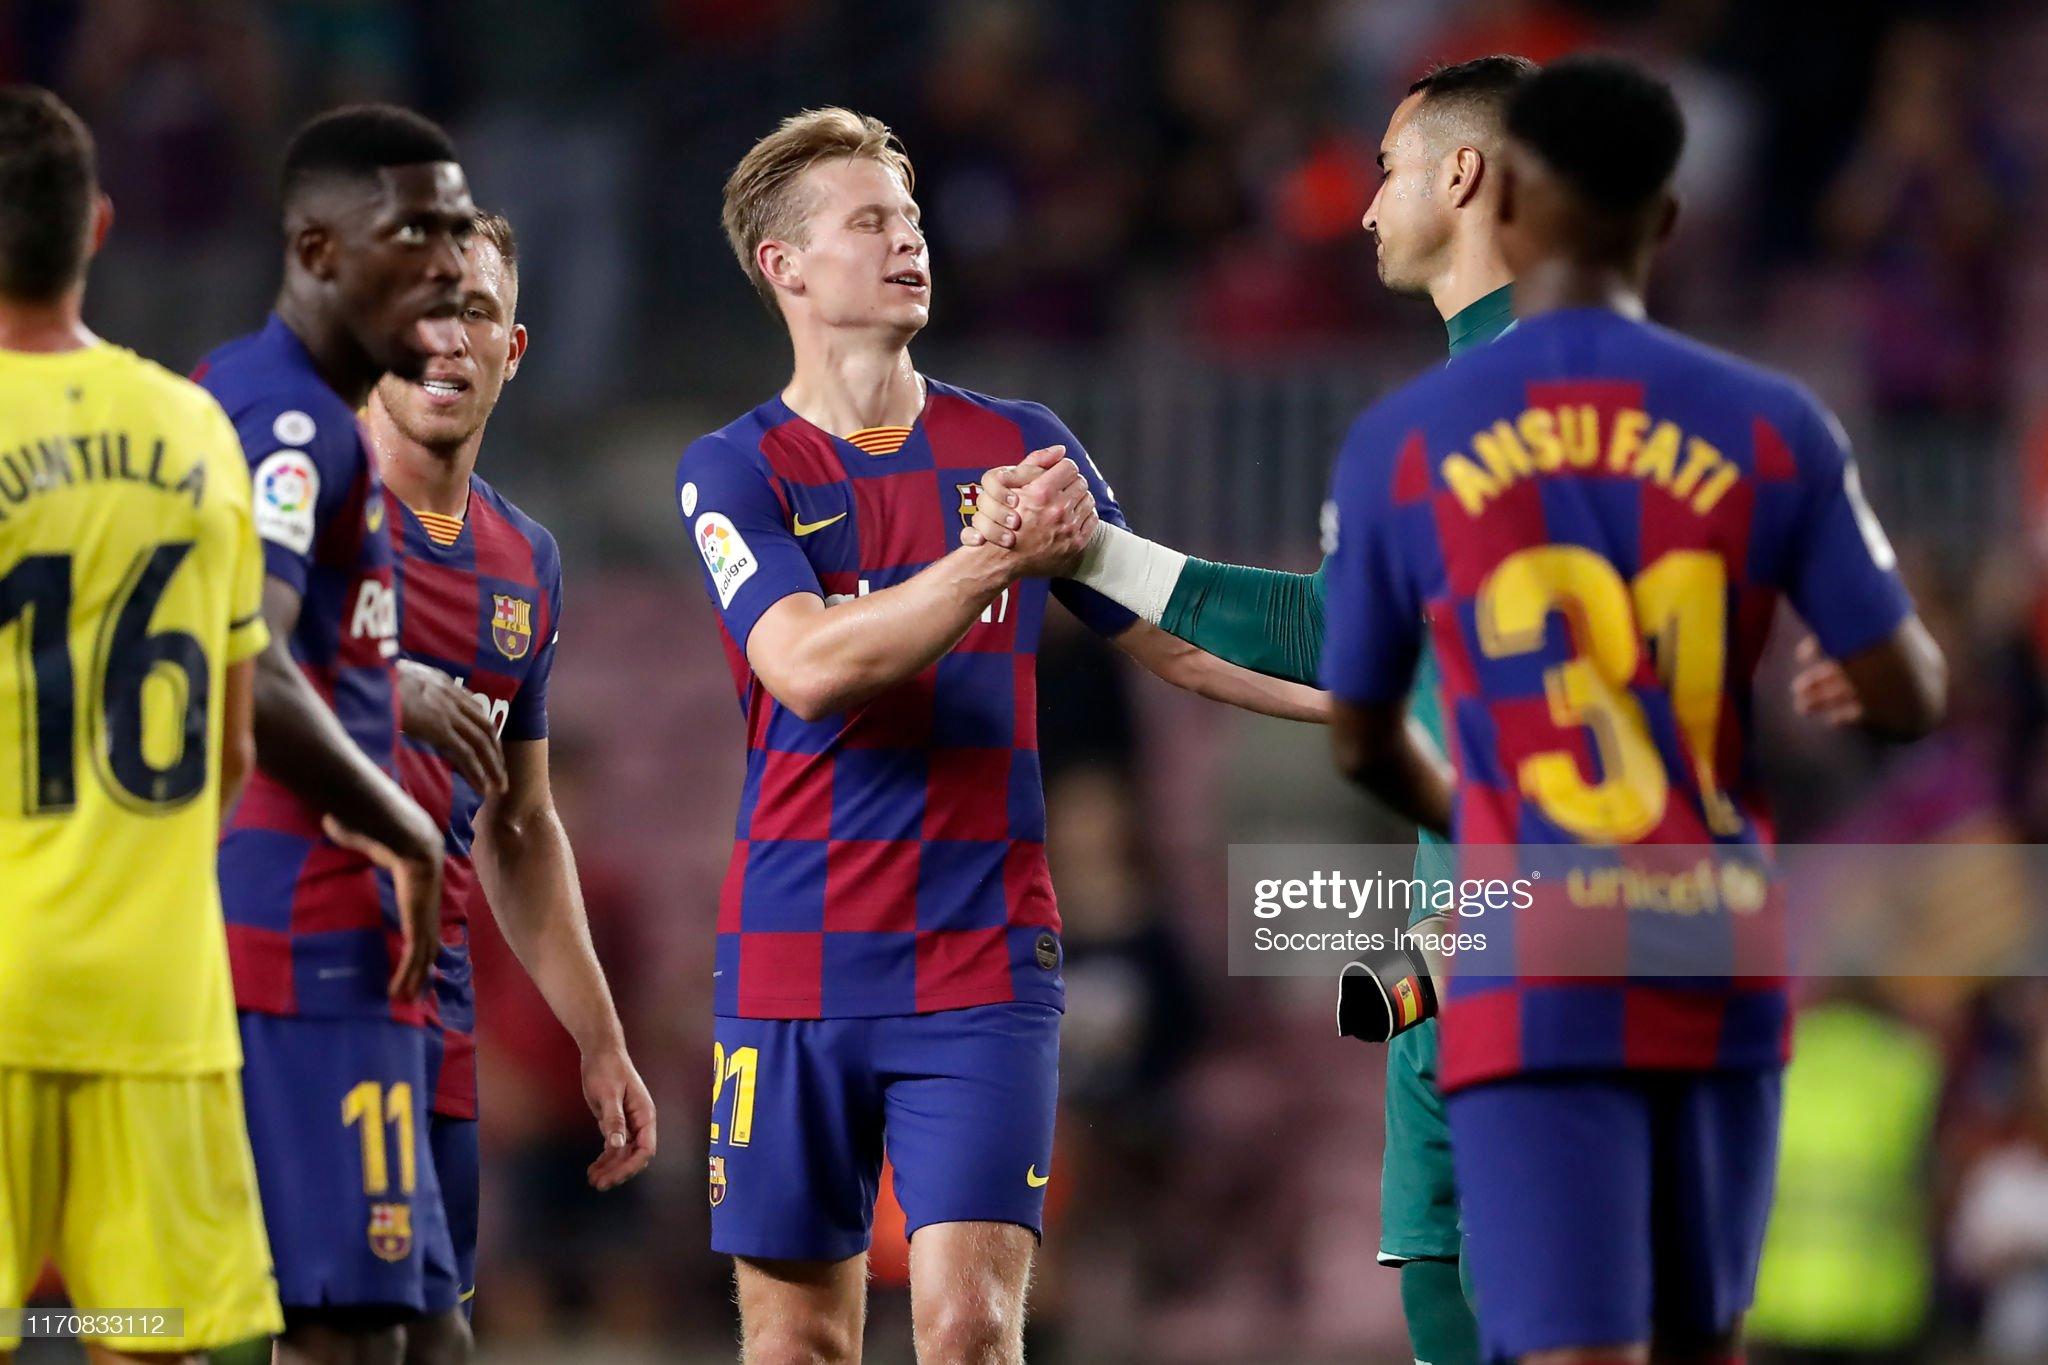 صور مباراة : برشلونة - فياريال 2-1 ( 24-09-2019 )  Frenkie-de-jong-of-fc-barcelona-celebrates-the-victory-during-the-la-picture-id1170833112?s=2048x2048